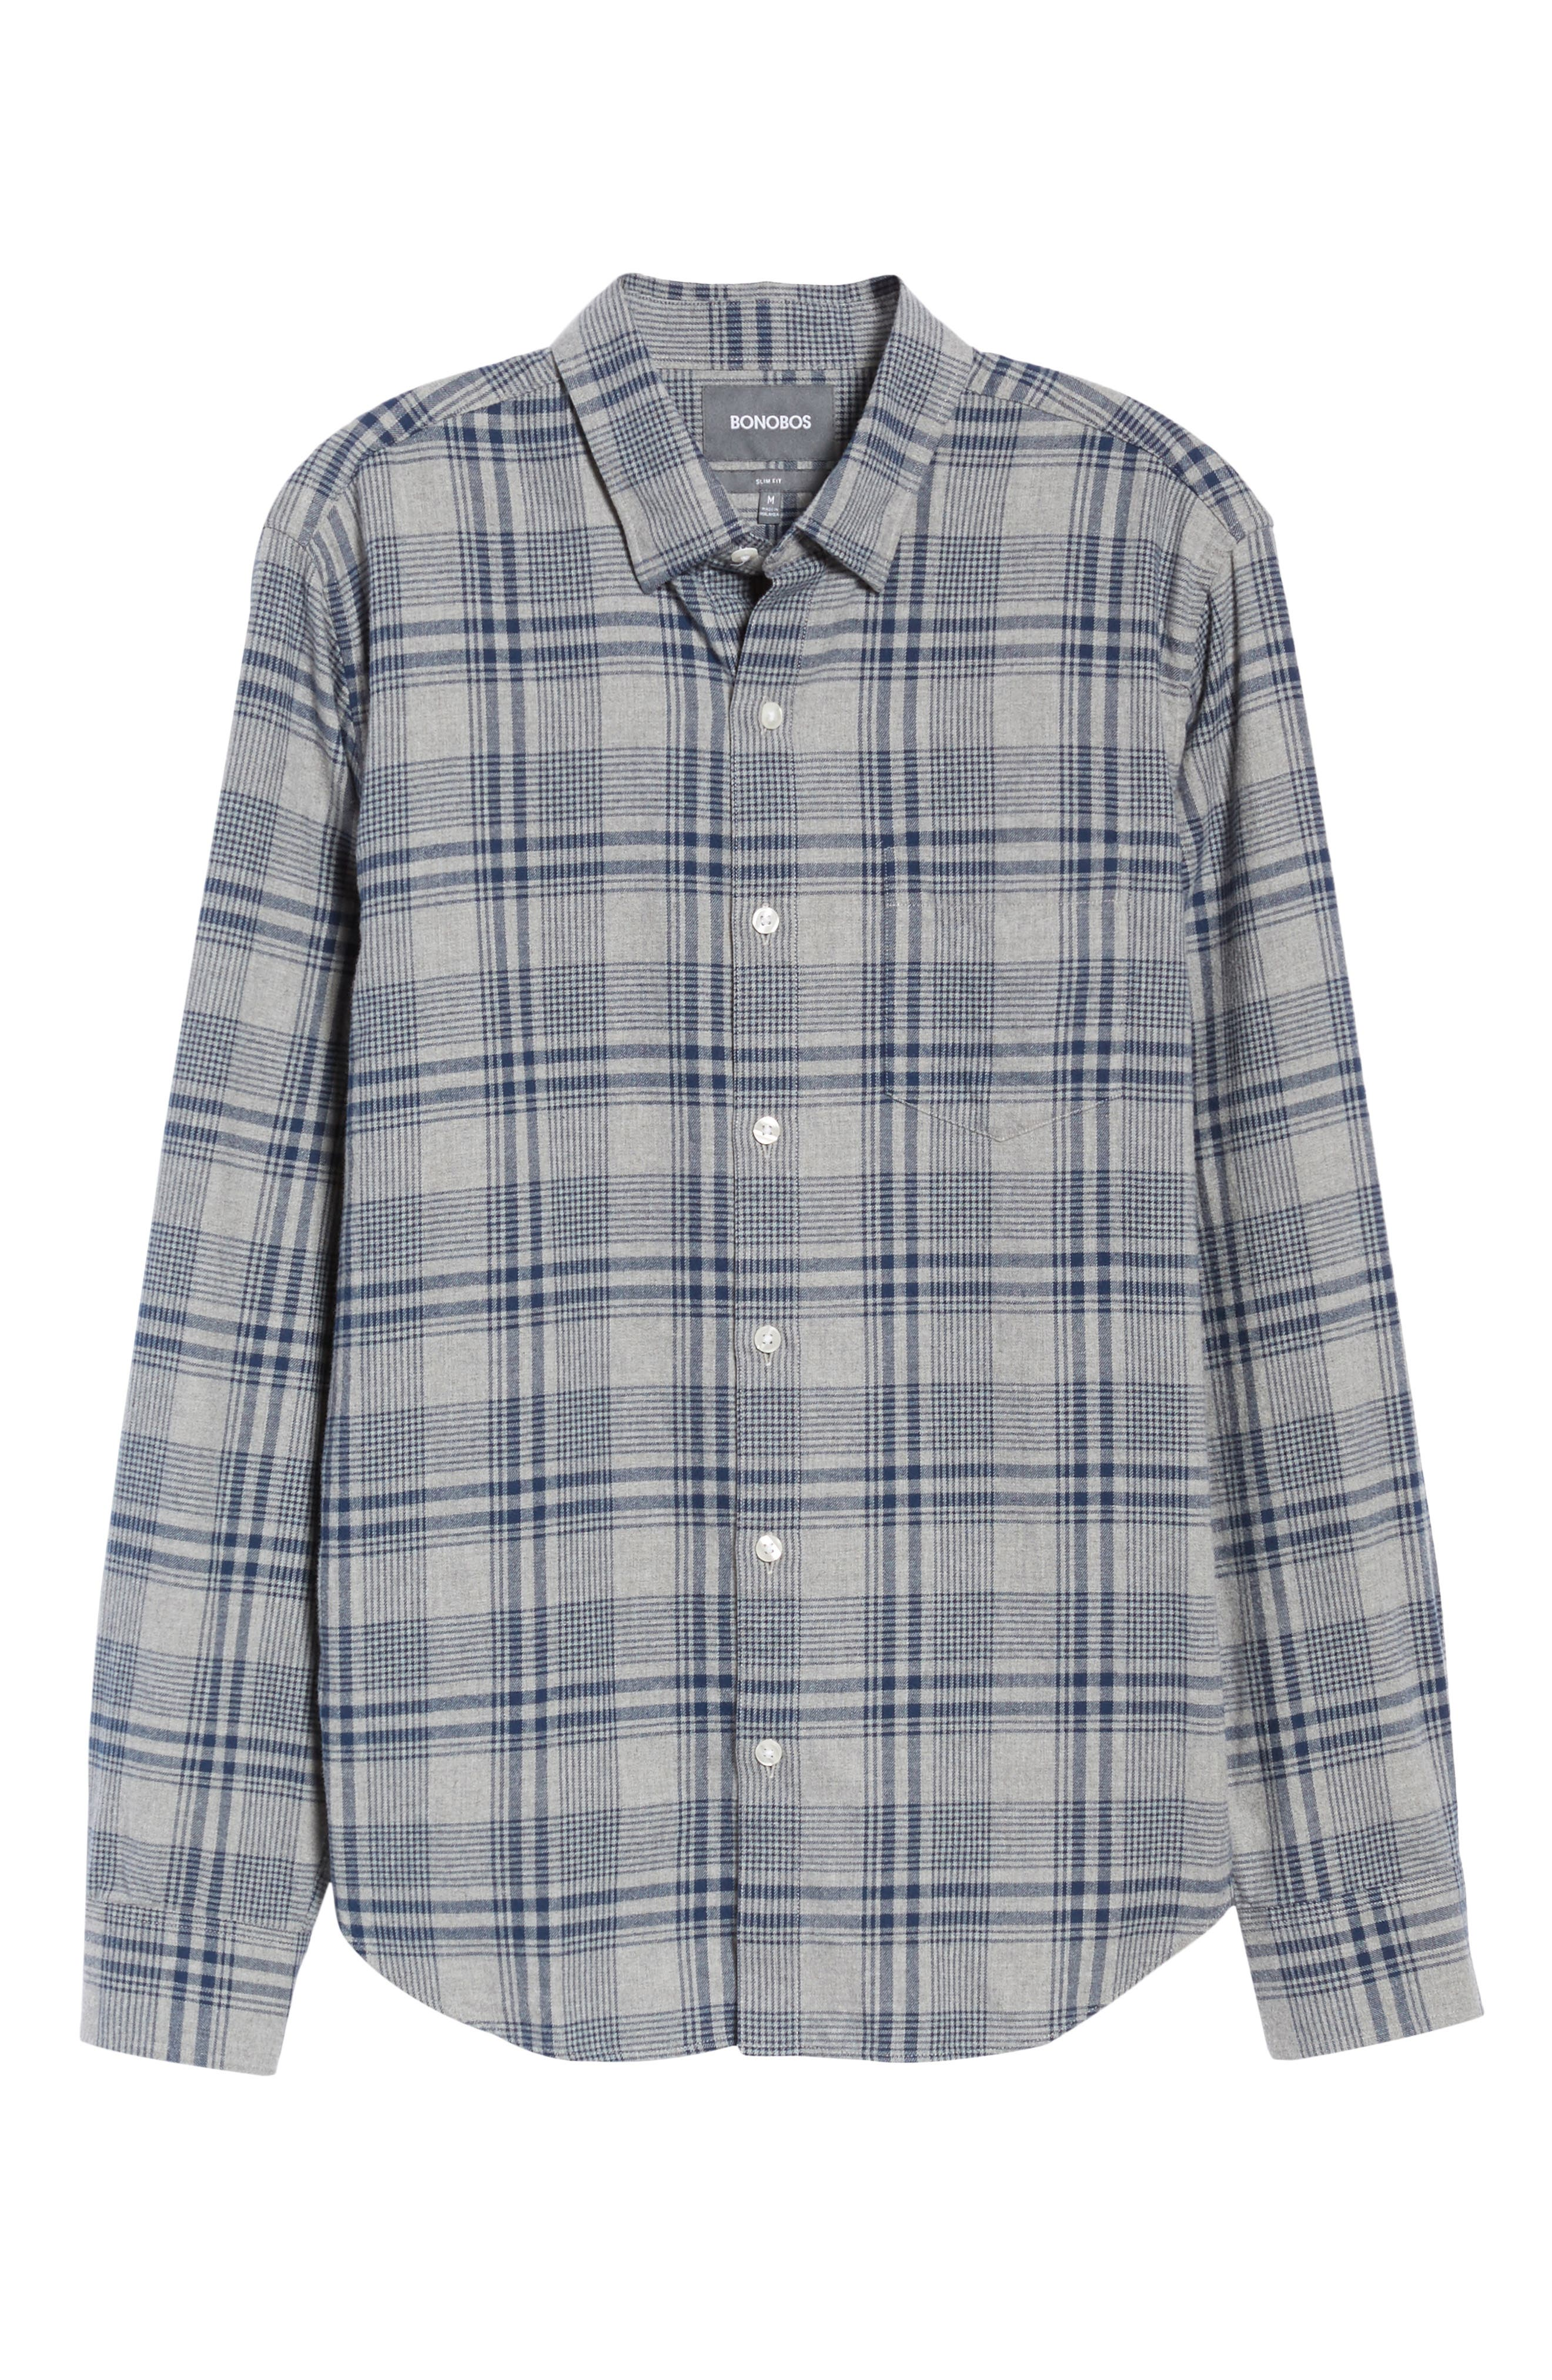 Slim Fit Brushed Plaid Sport Shirt,                             Alternate thumbnail 6, color,                             Rivercrest Plaid Navy